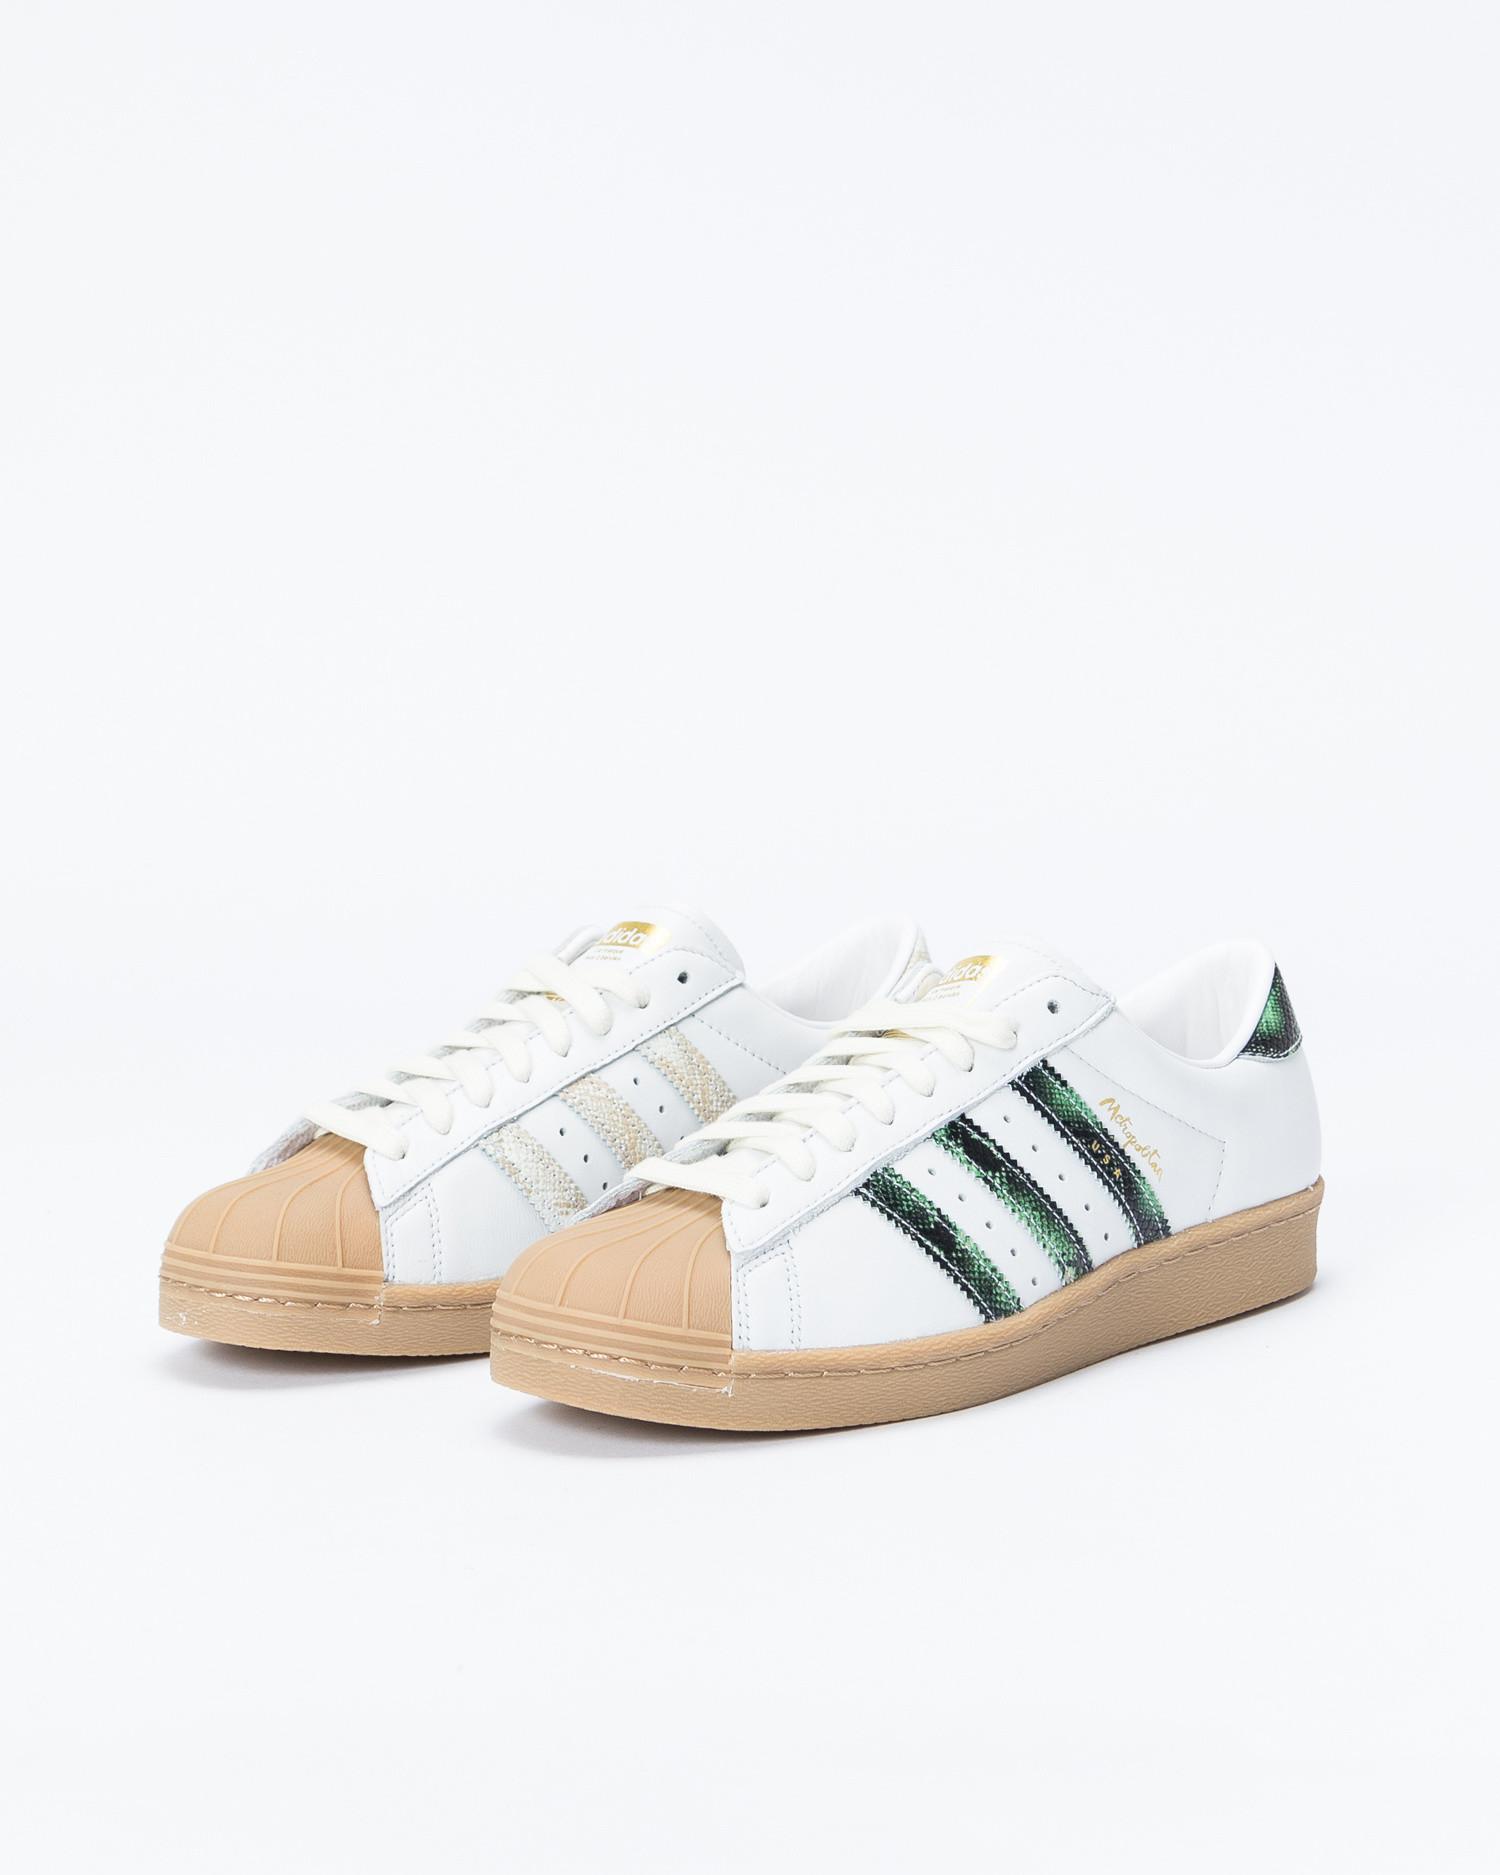 Adidas Superstar 80's X Metropolitan Crywhite/Coregreen/Gum4